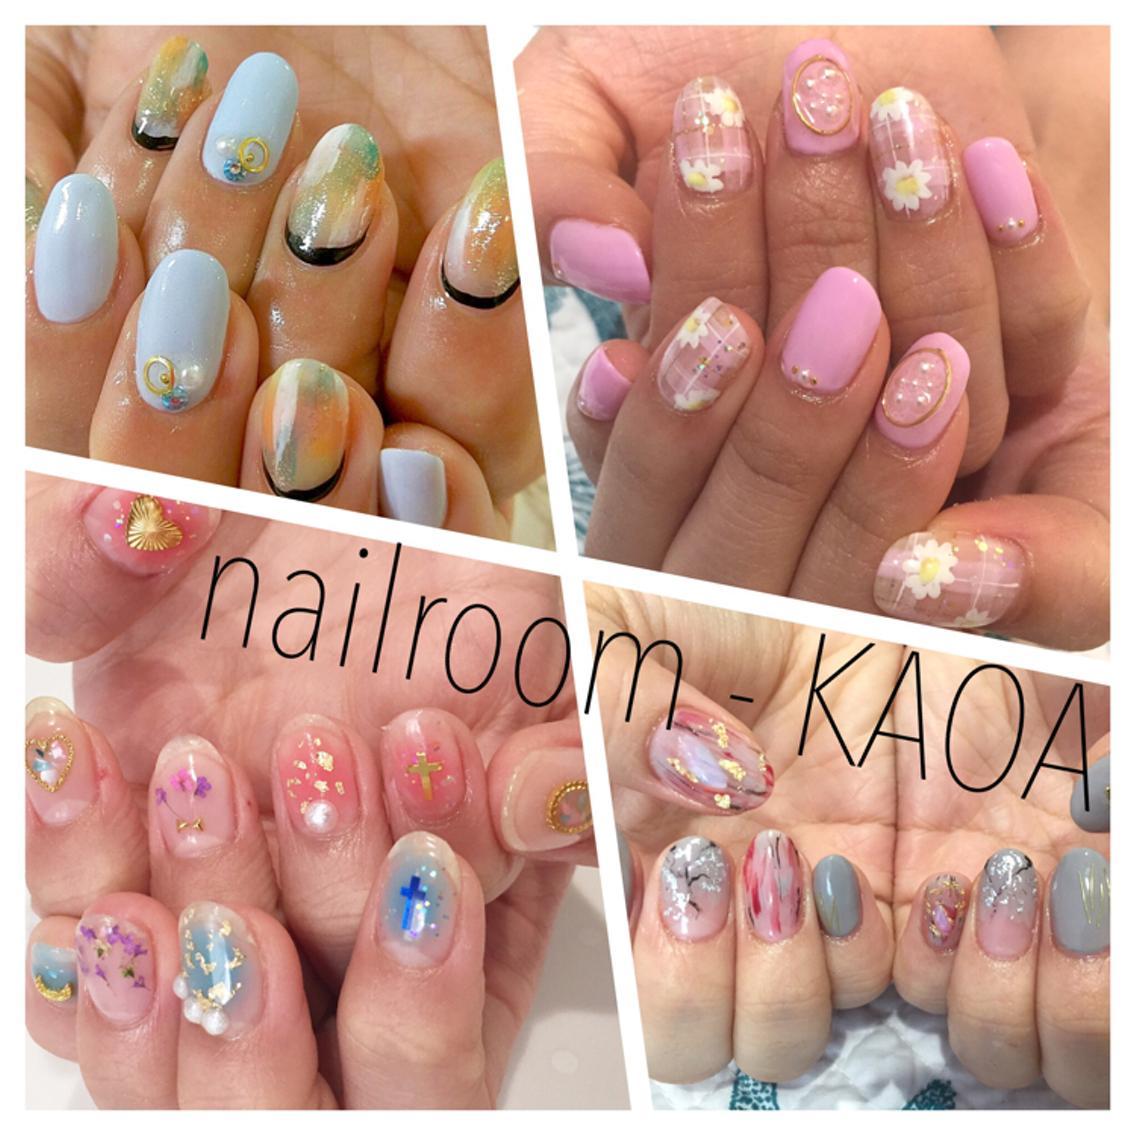 nailroom KANOA所属・nailroom-KANOAの掲載